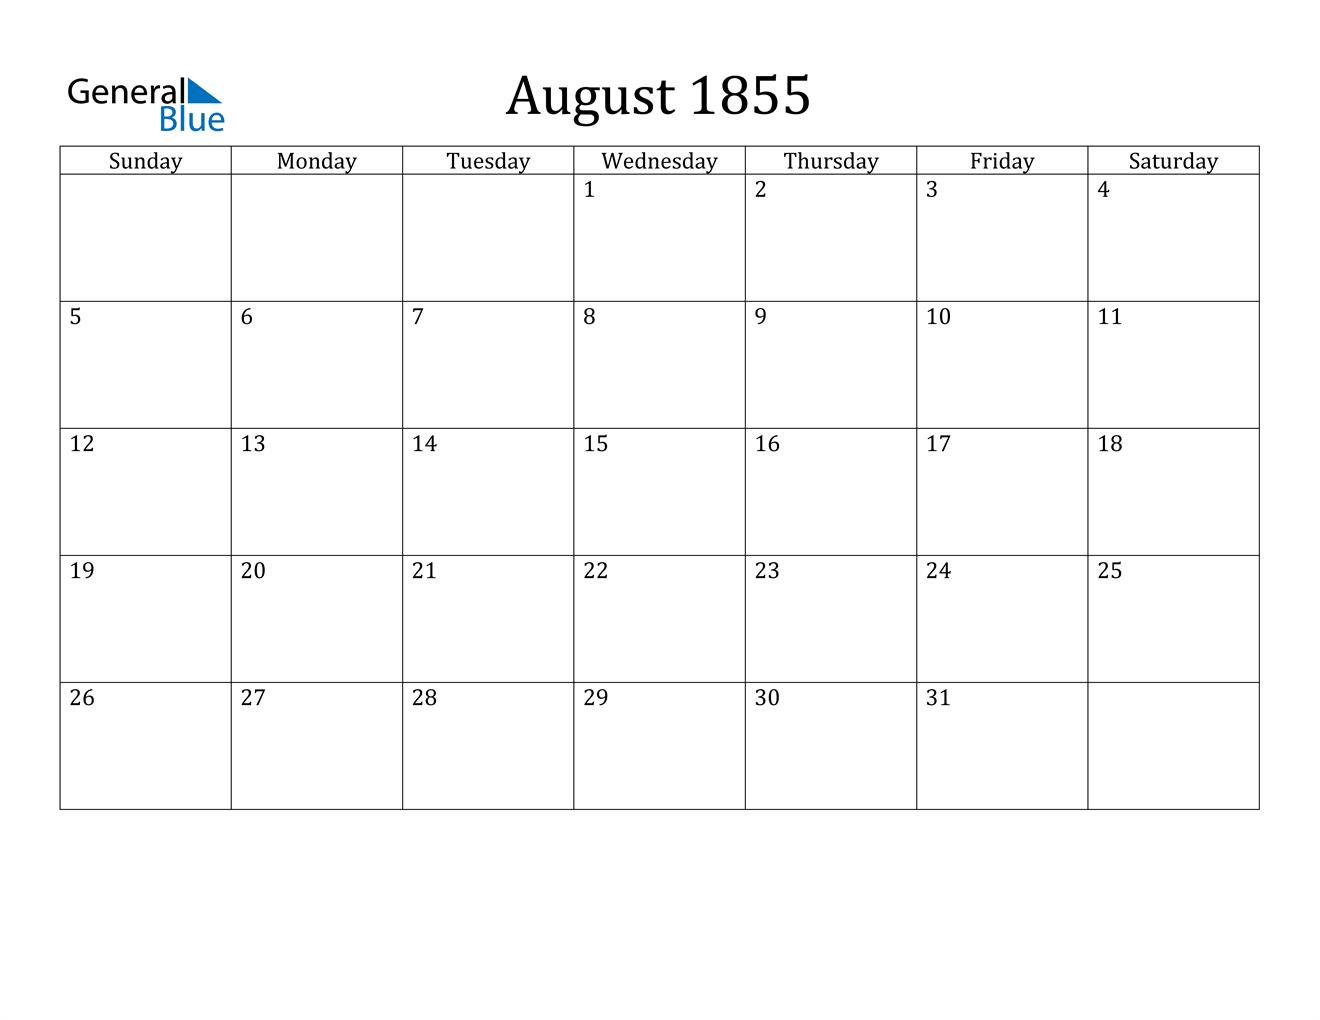 Image of August 1855 Calendar